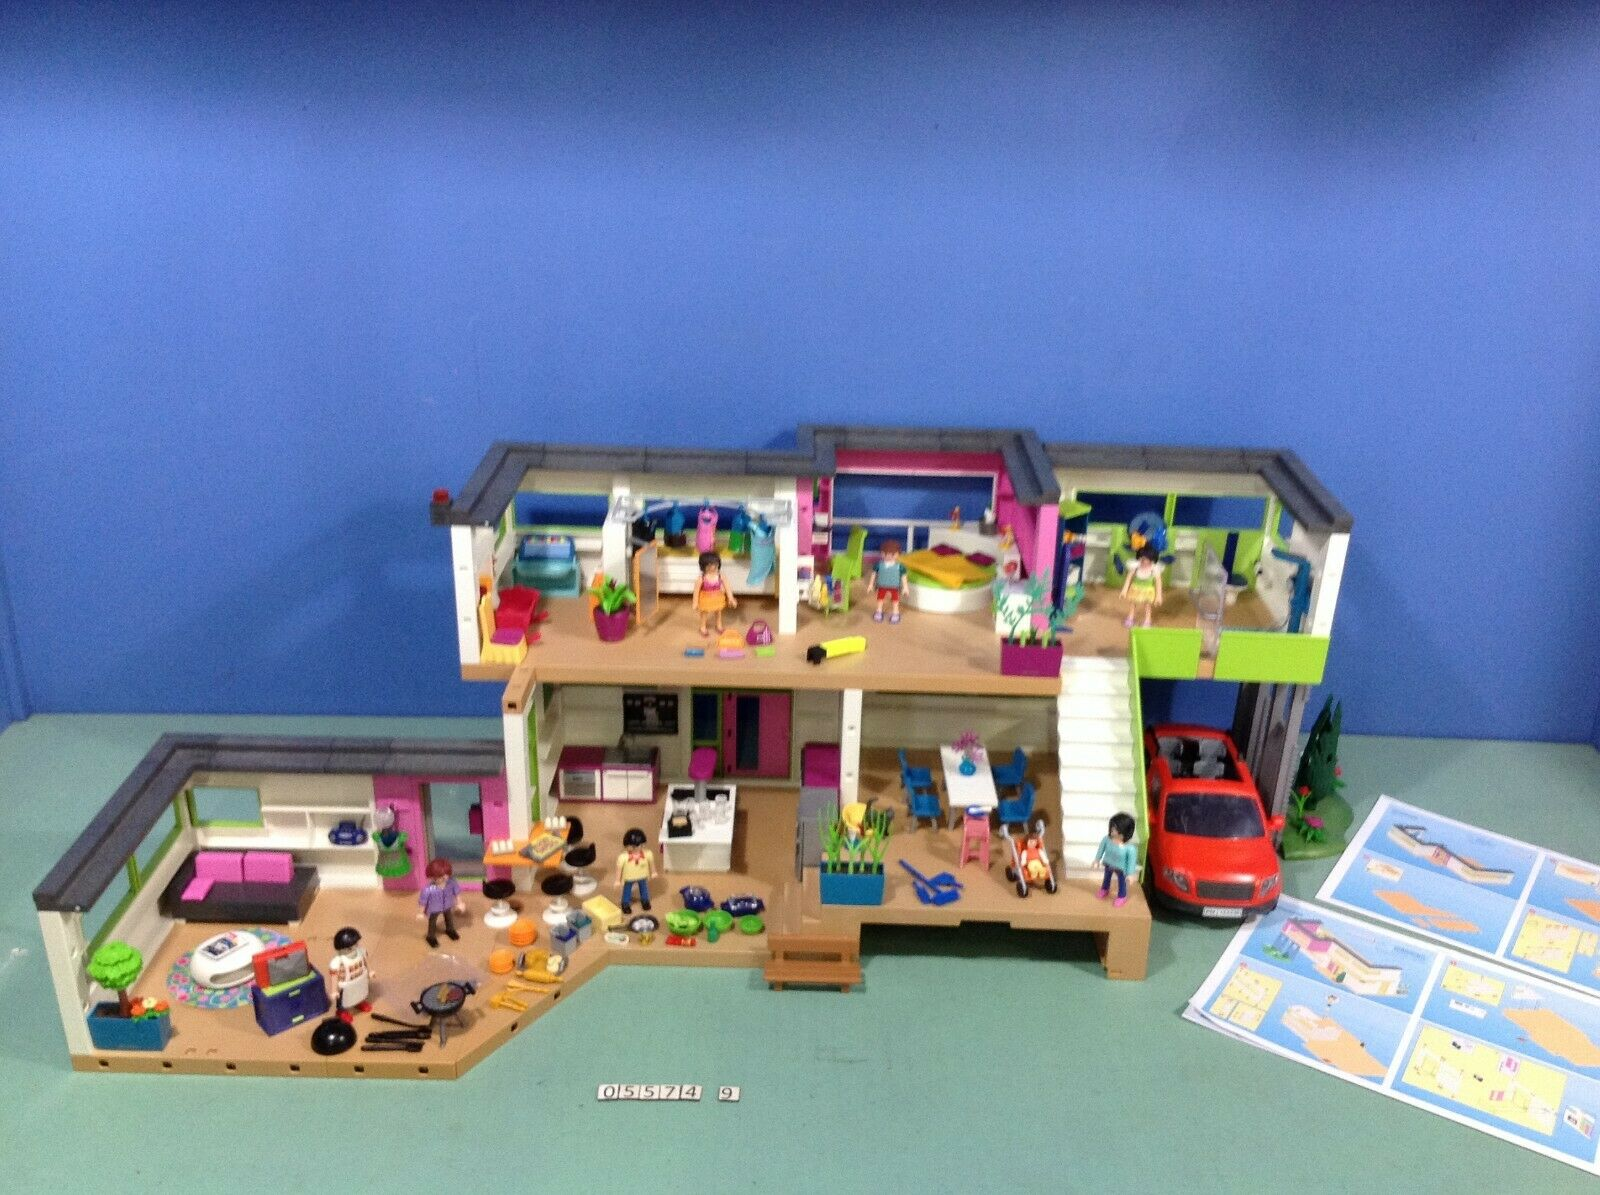 (O5574.9) playmobil grande maison moderne ref 5574 + 10 ref